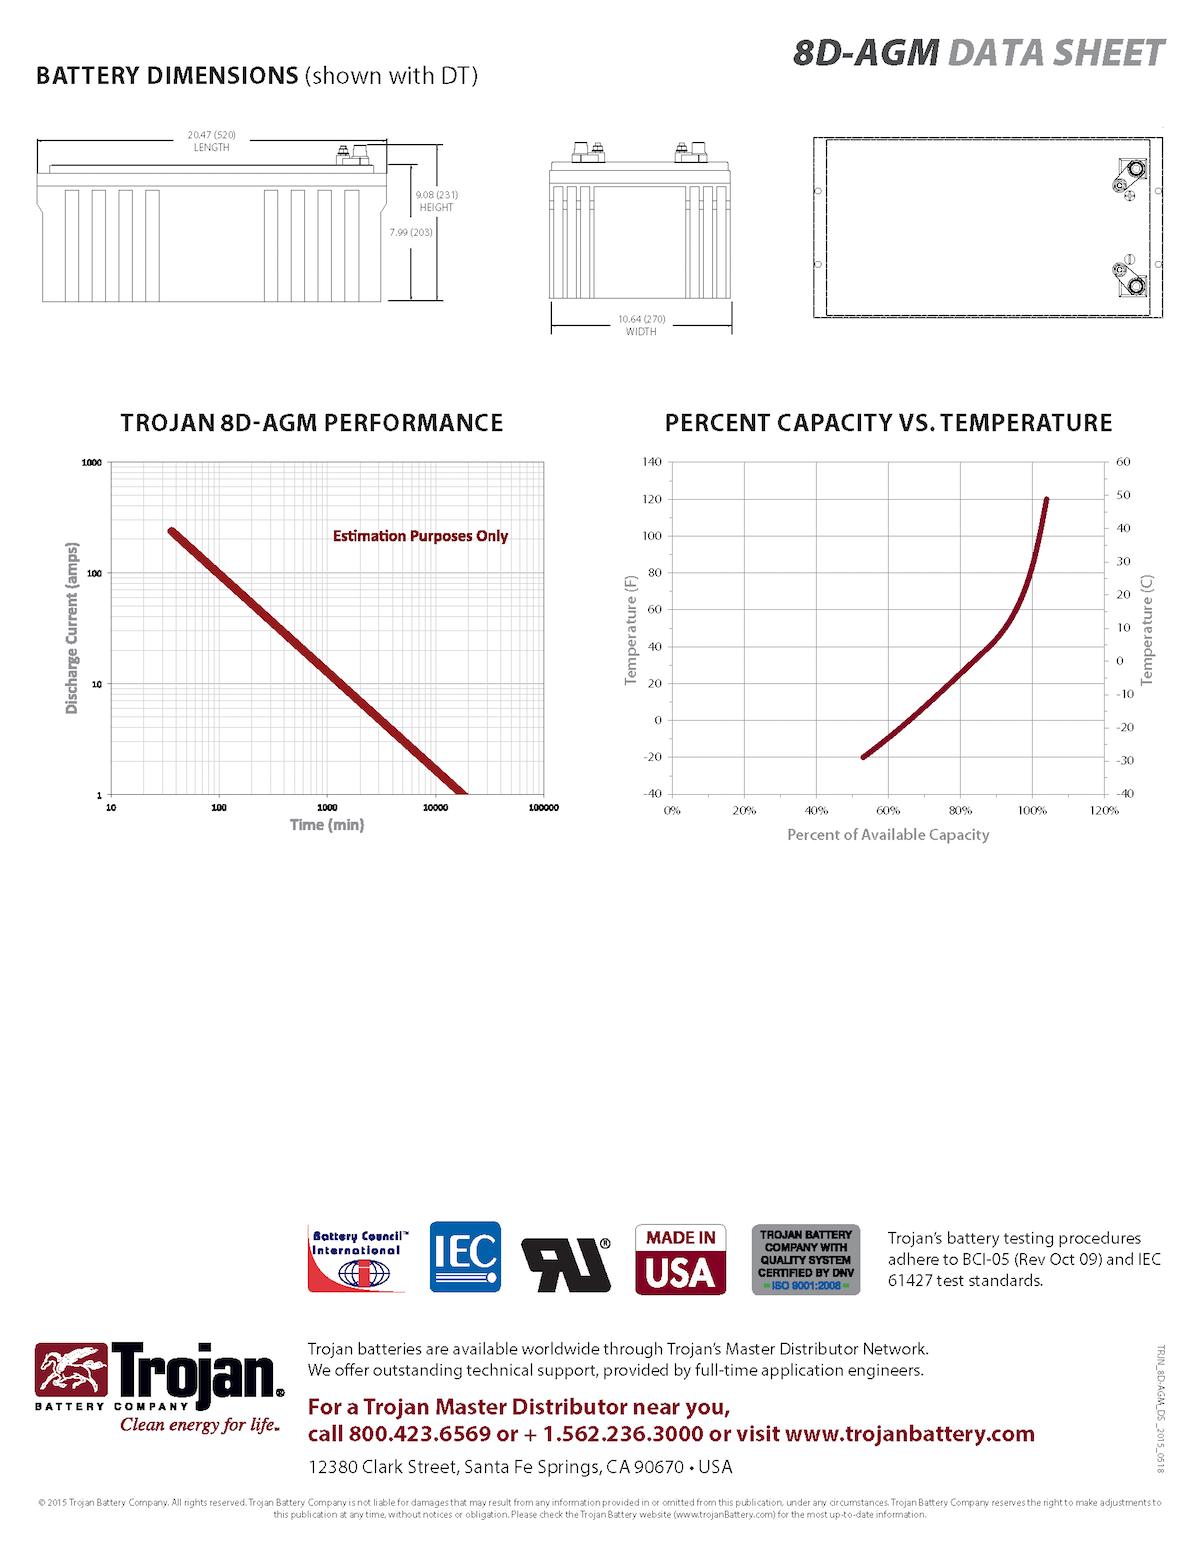 8DAGM_Trojan_Data_Sheets (1)_Page_2